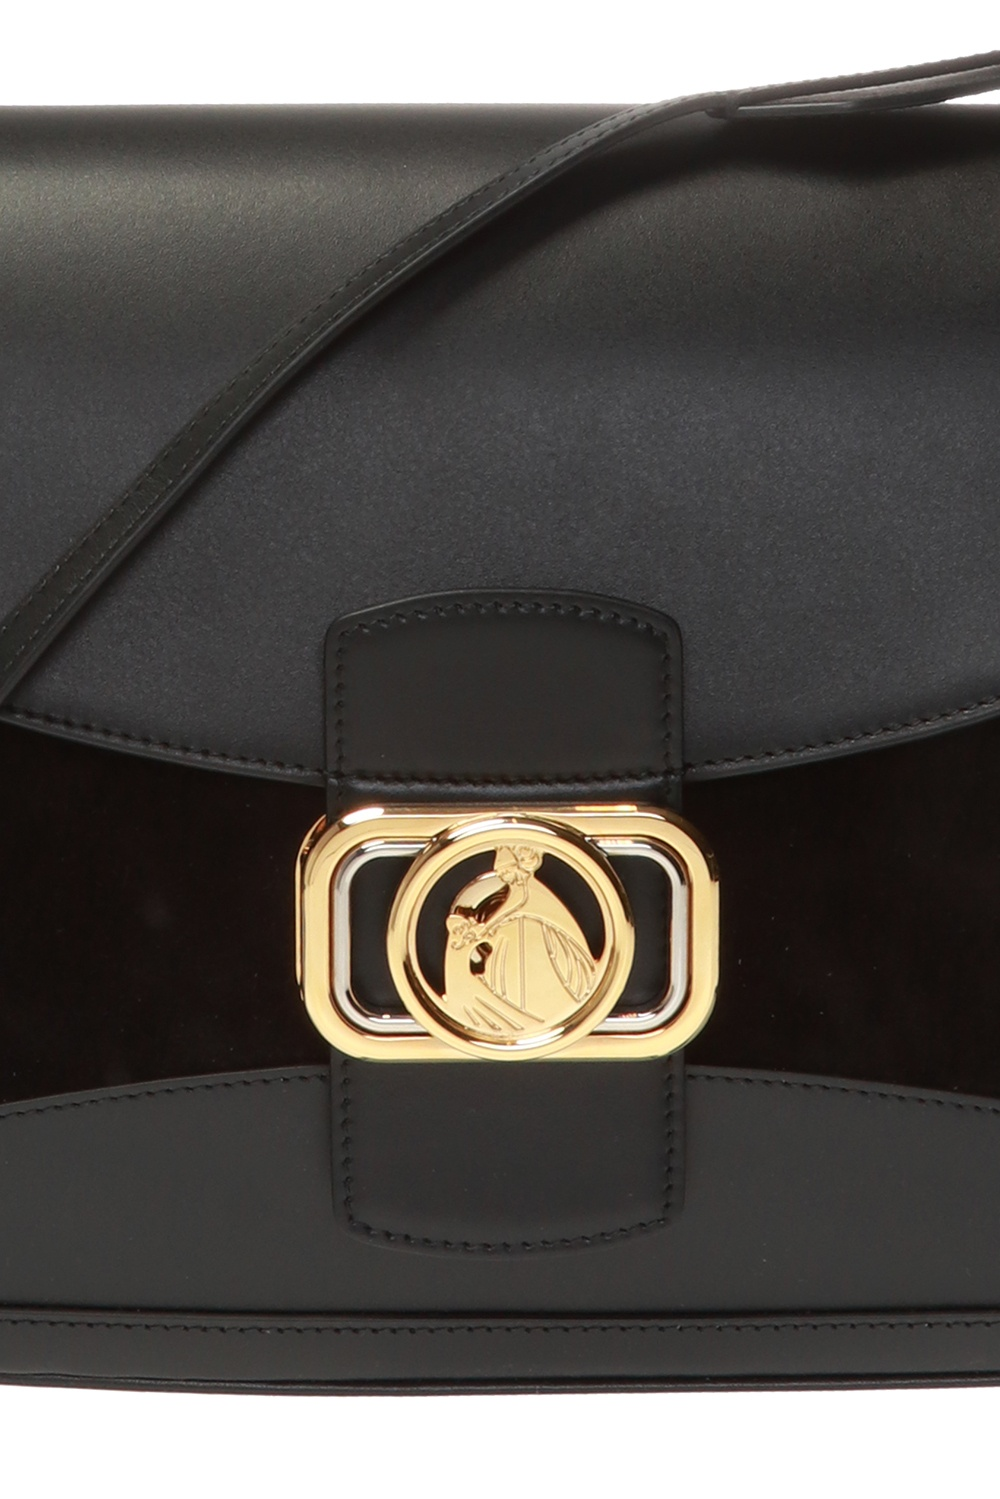 Lanvin Torba na ramię z logo 'Swan'